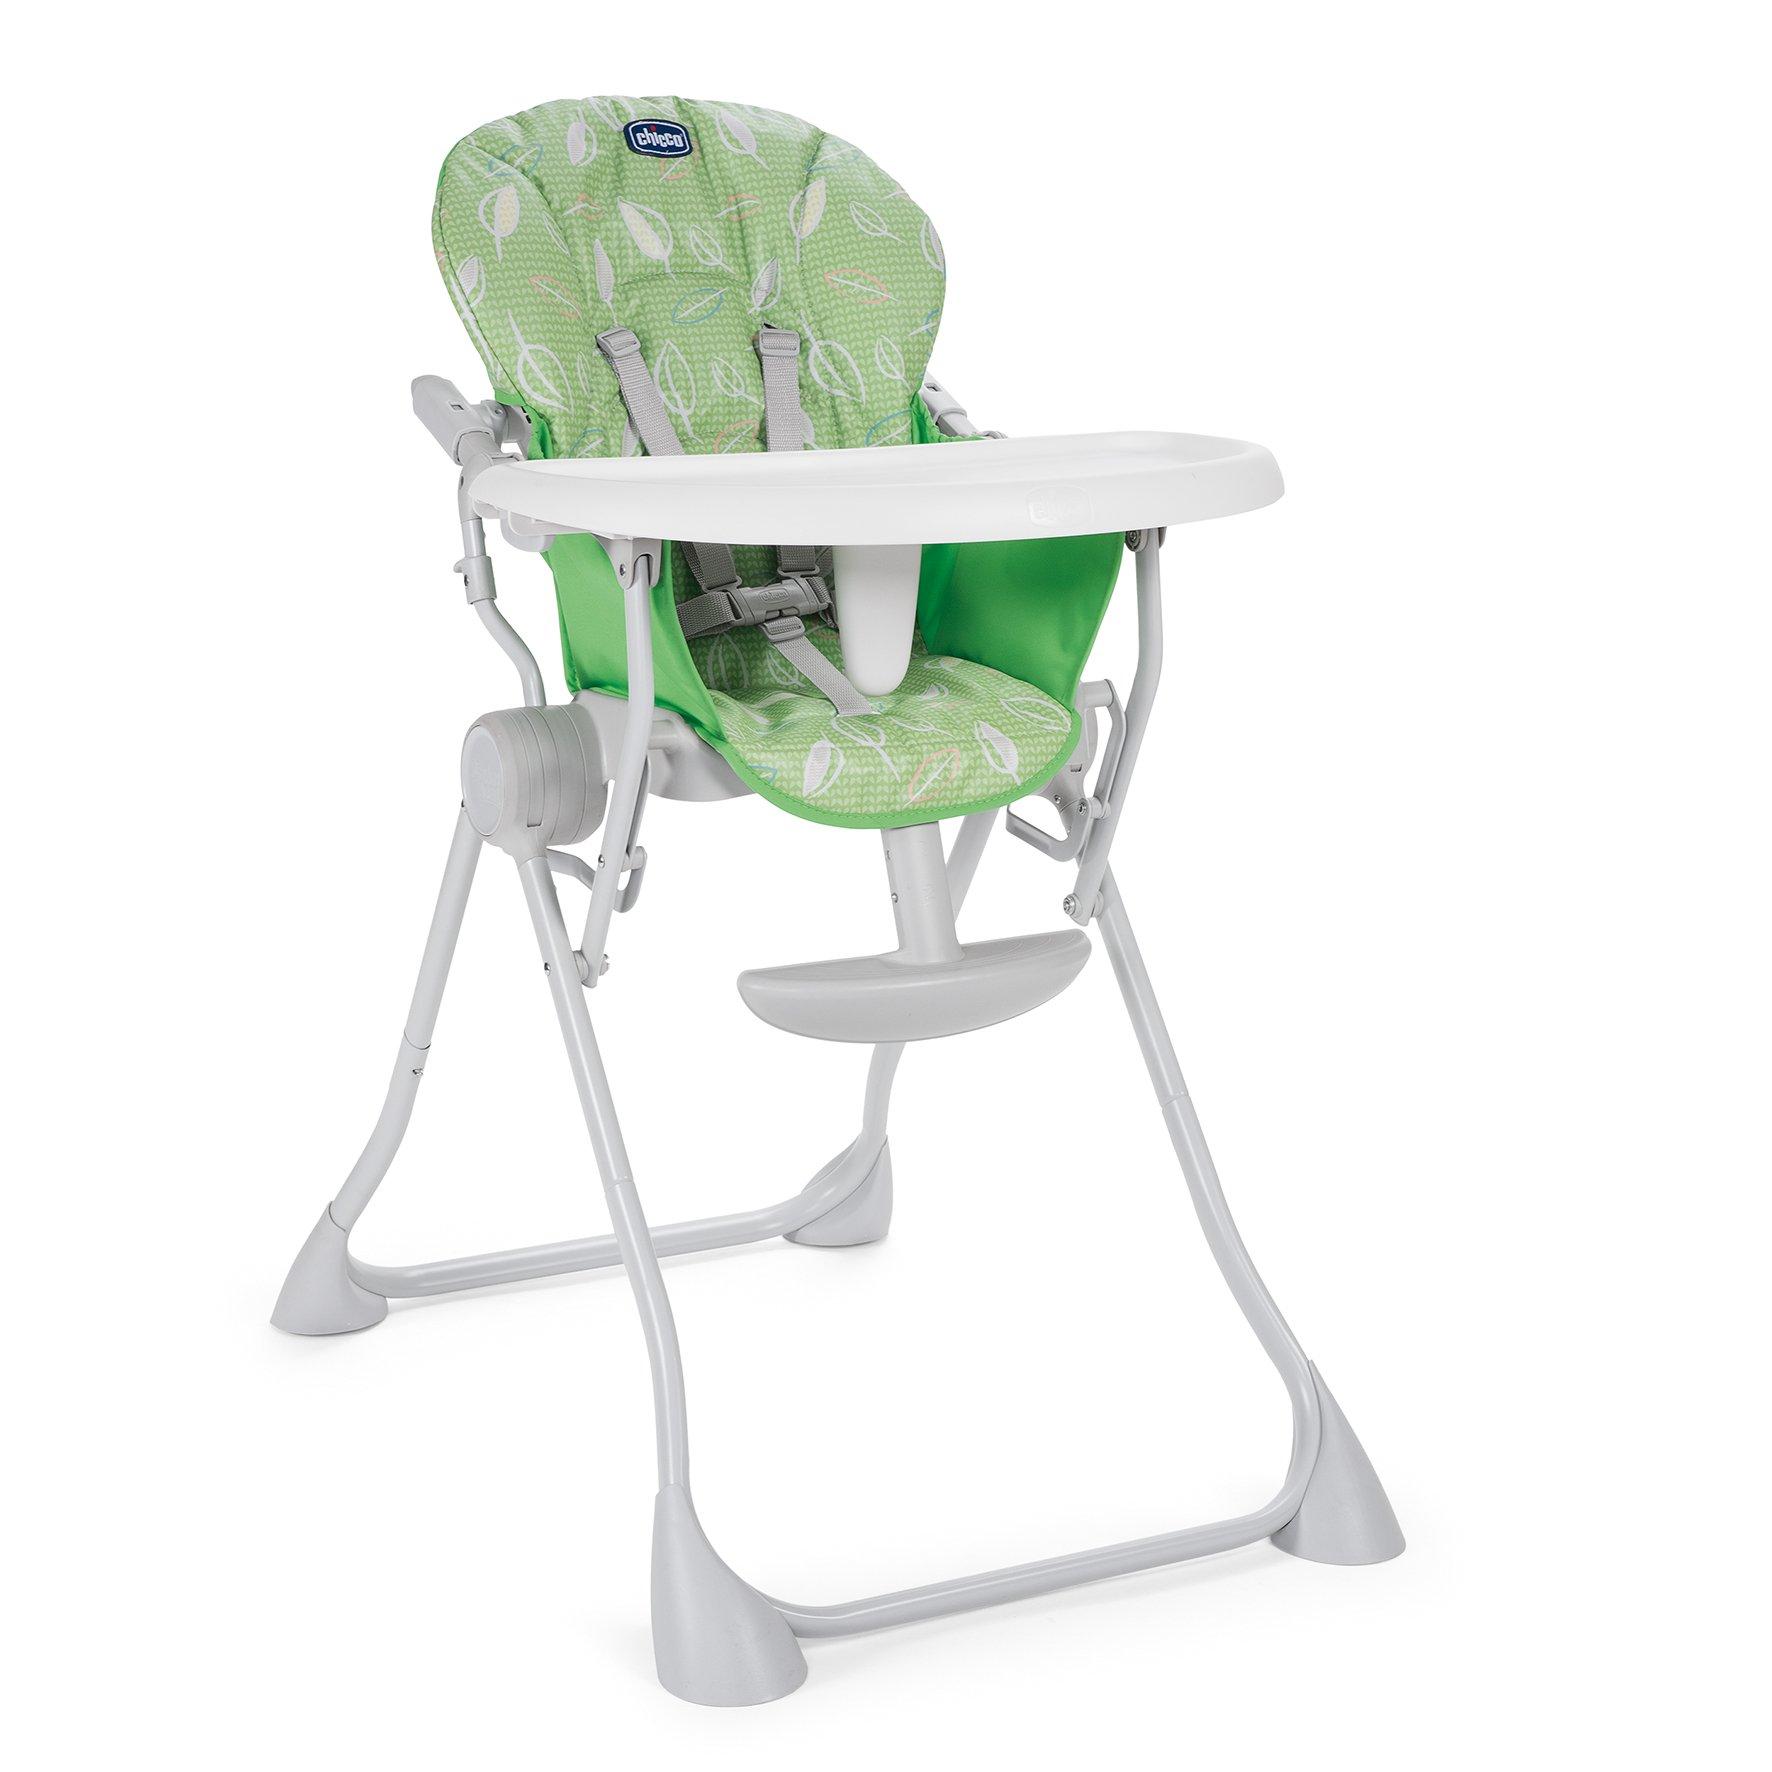 summer high chair posture ergonomic chicco highchair pocket meal 2019 green buy at kidsroom design